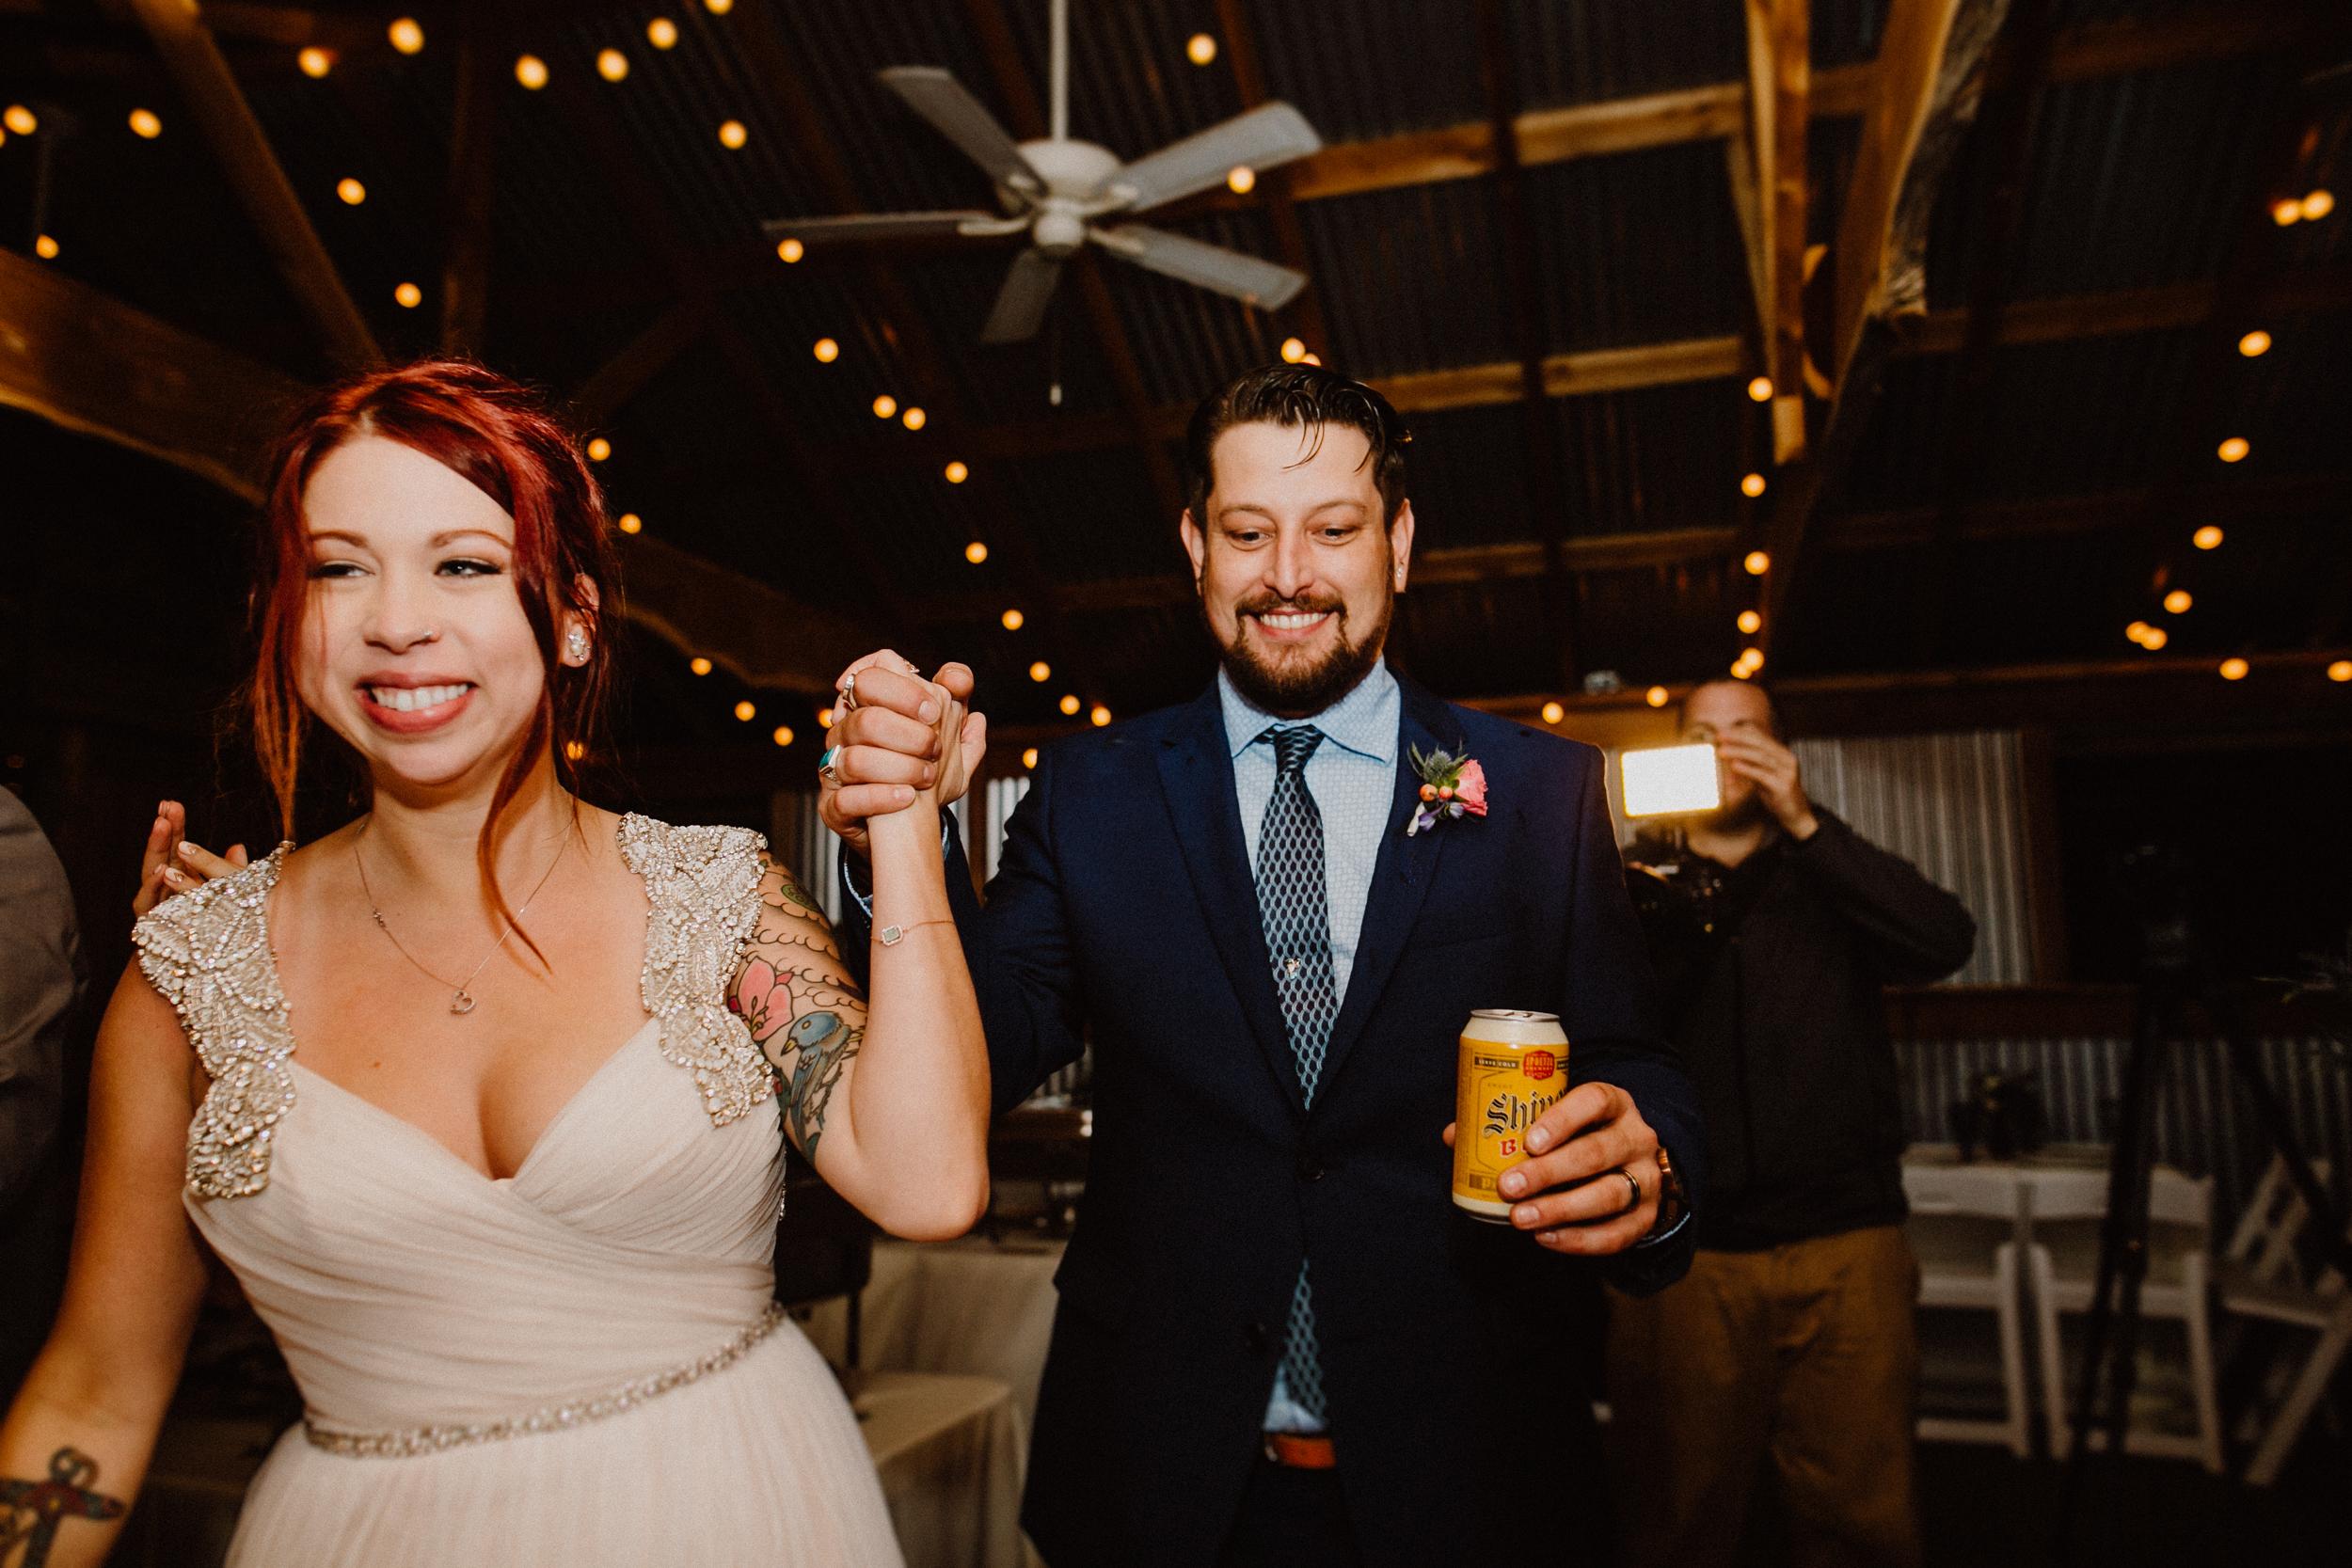 wildflower-barn-wedding-k&k-426.jpg